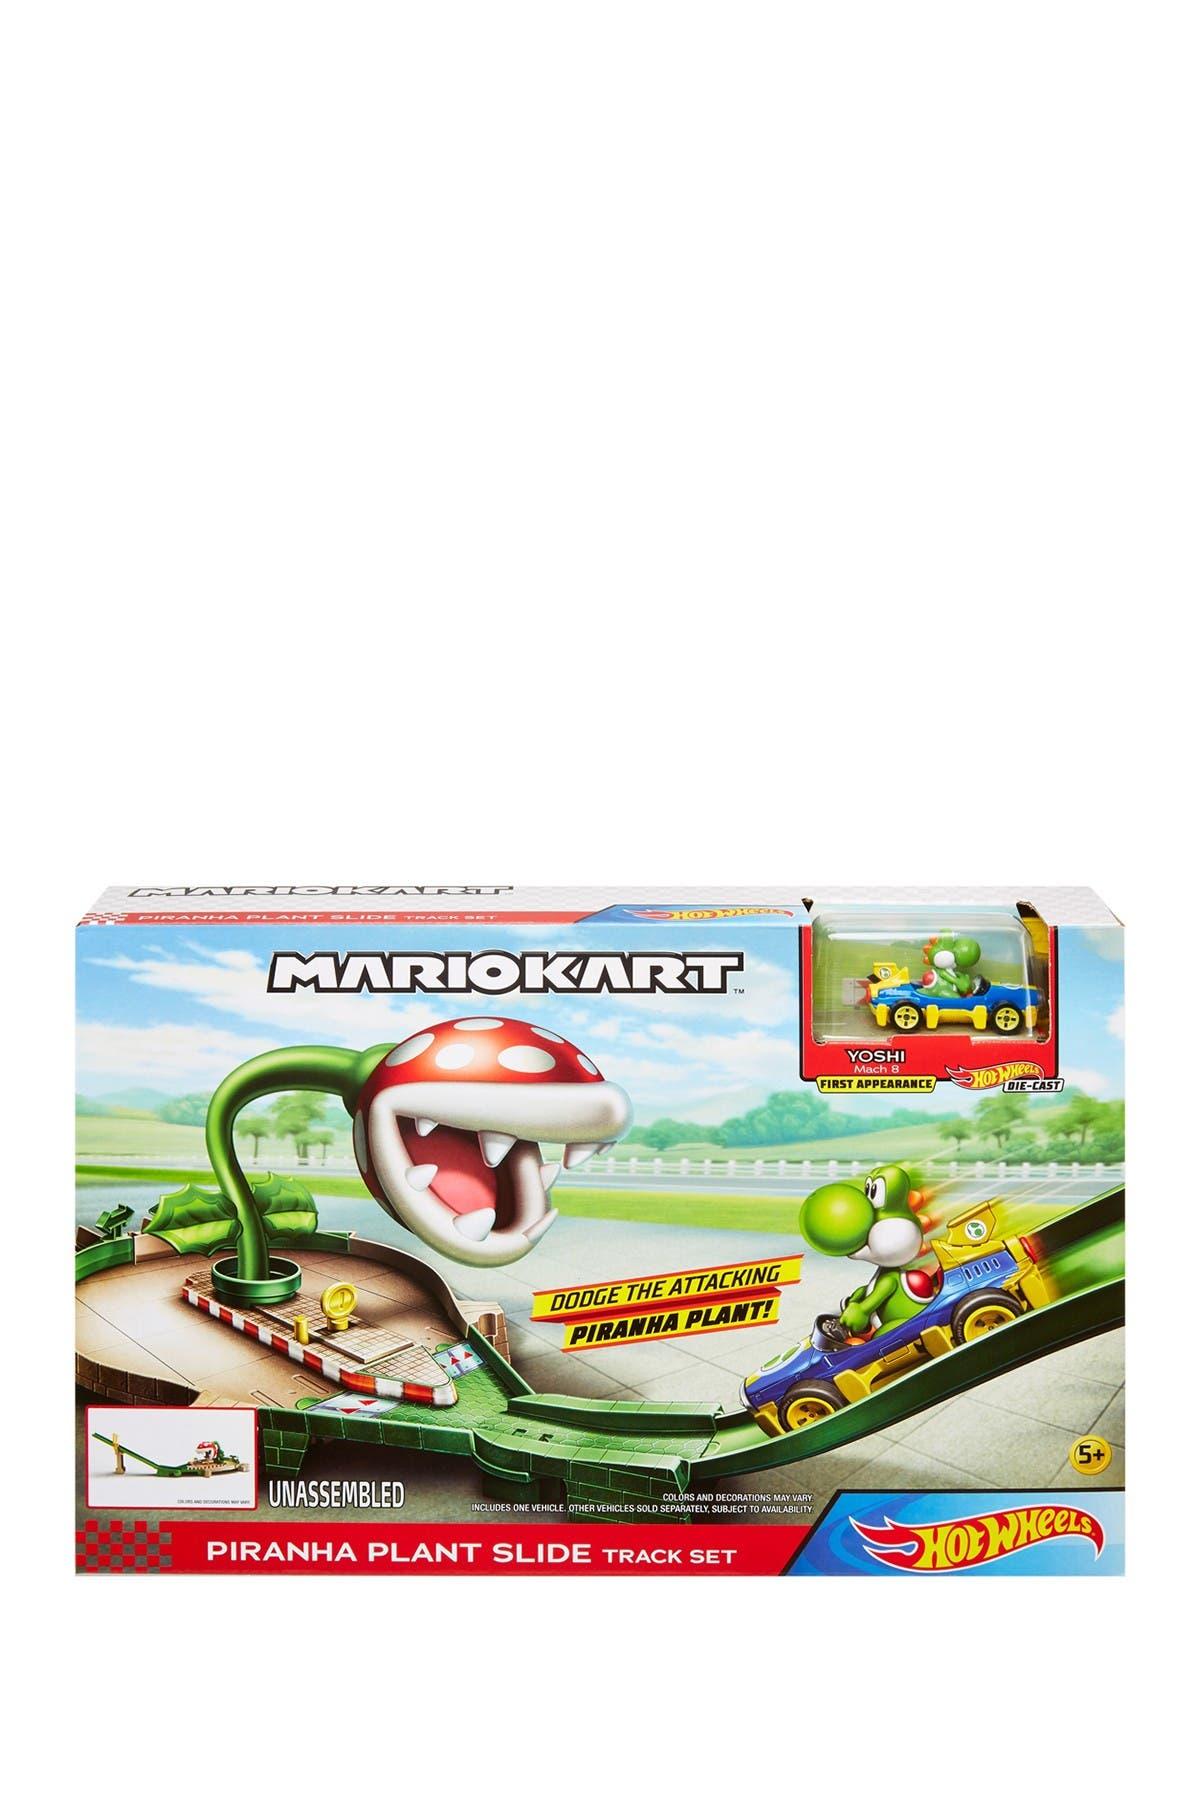 Image of Mattel Hot Wheels(R) Mario Kart Nemesis Track Set - Piranha Plant Slide